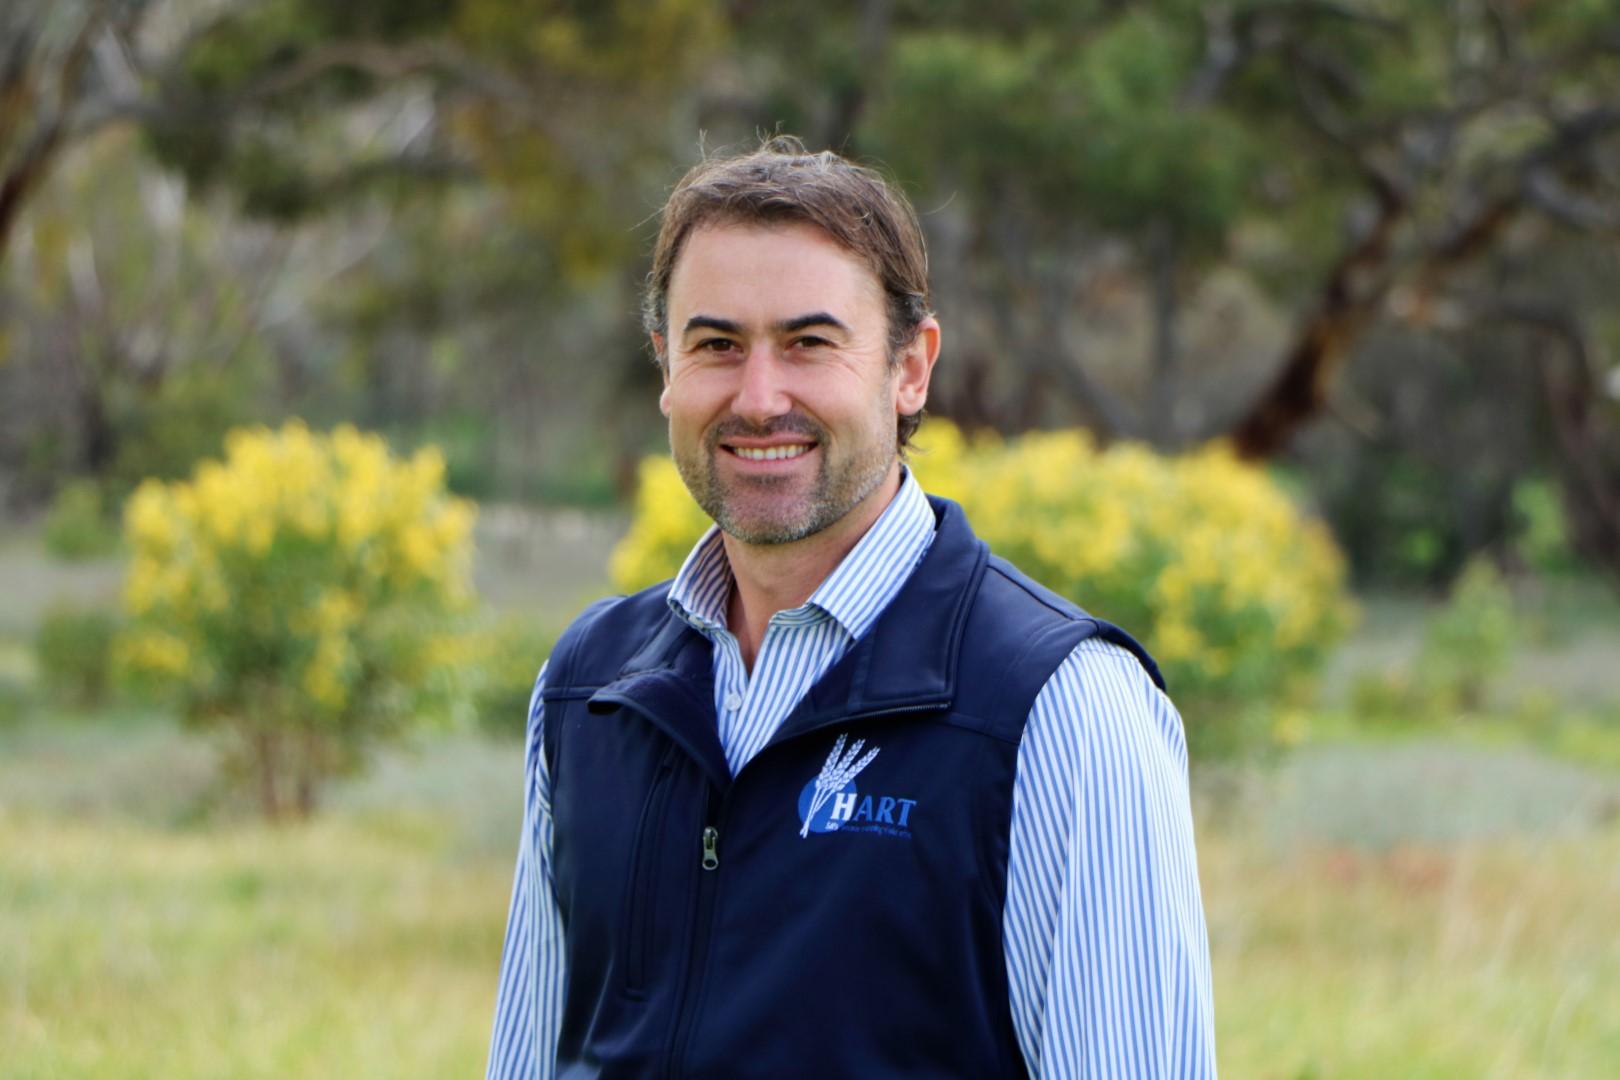 Hart Chairman, Ryan Wood